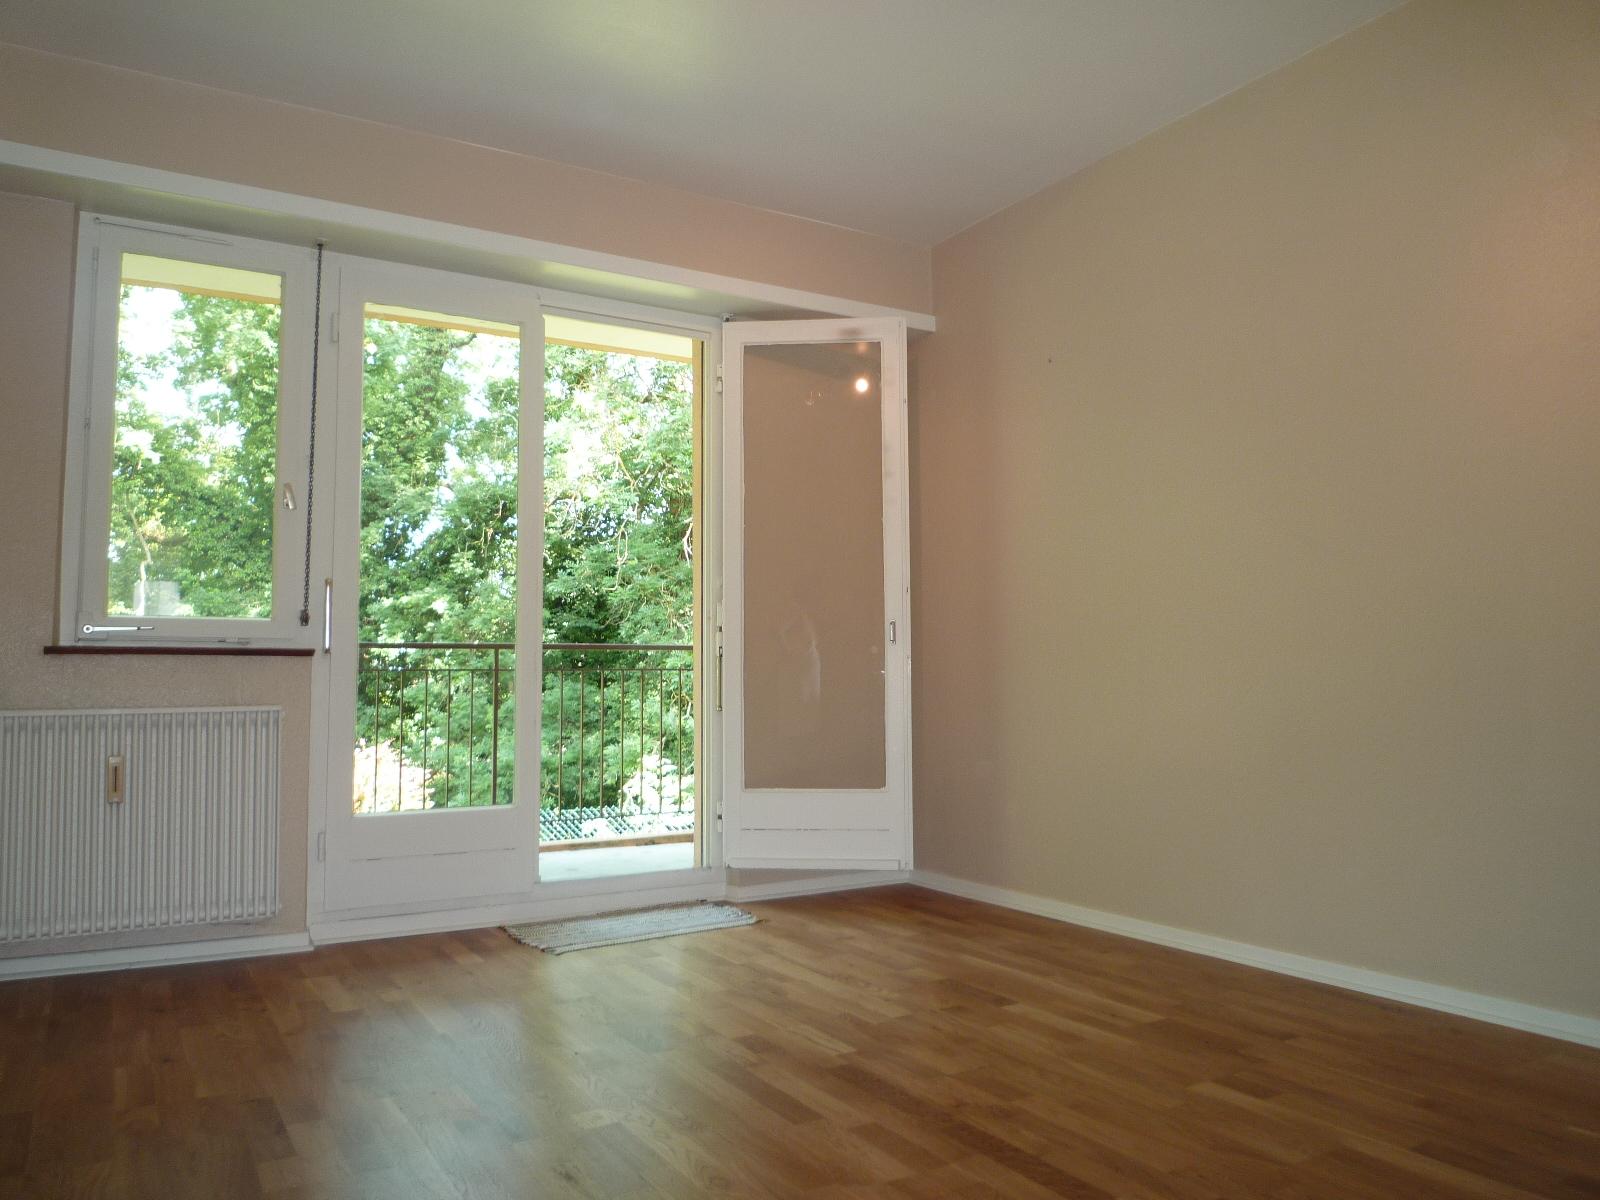 [Jungle] Beau 3 pièces avec balcon - Meinau / rue du Rhin Tortu - nos locations - Beausite Immobilier 1